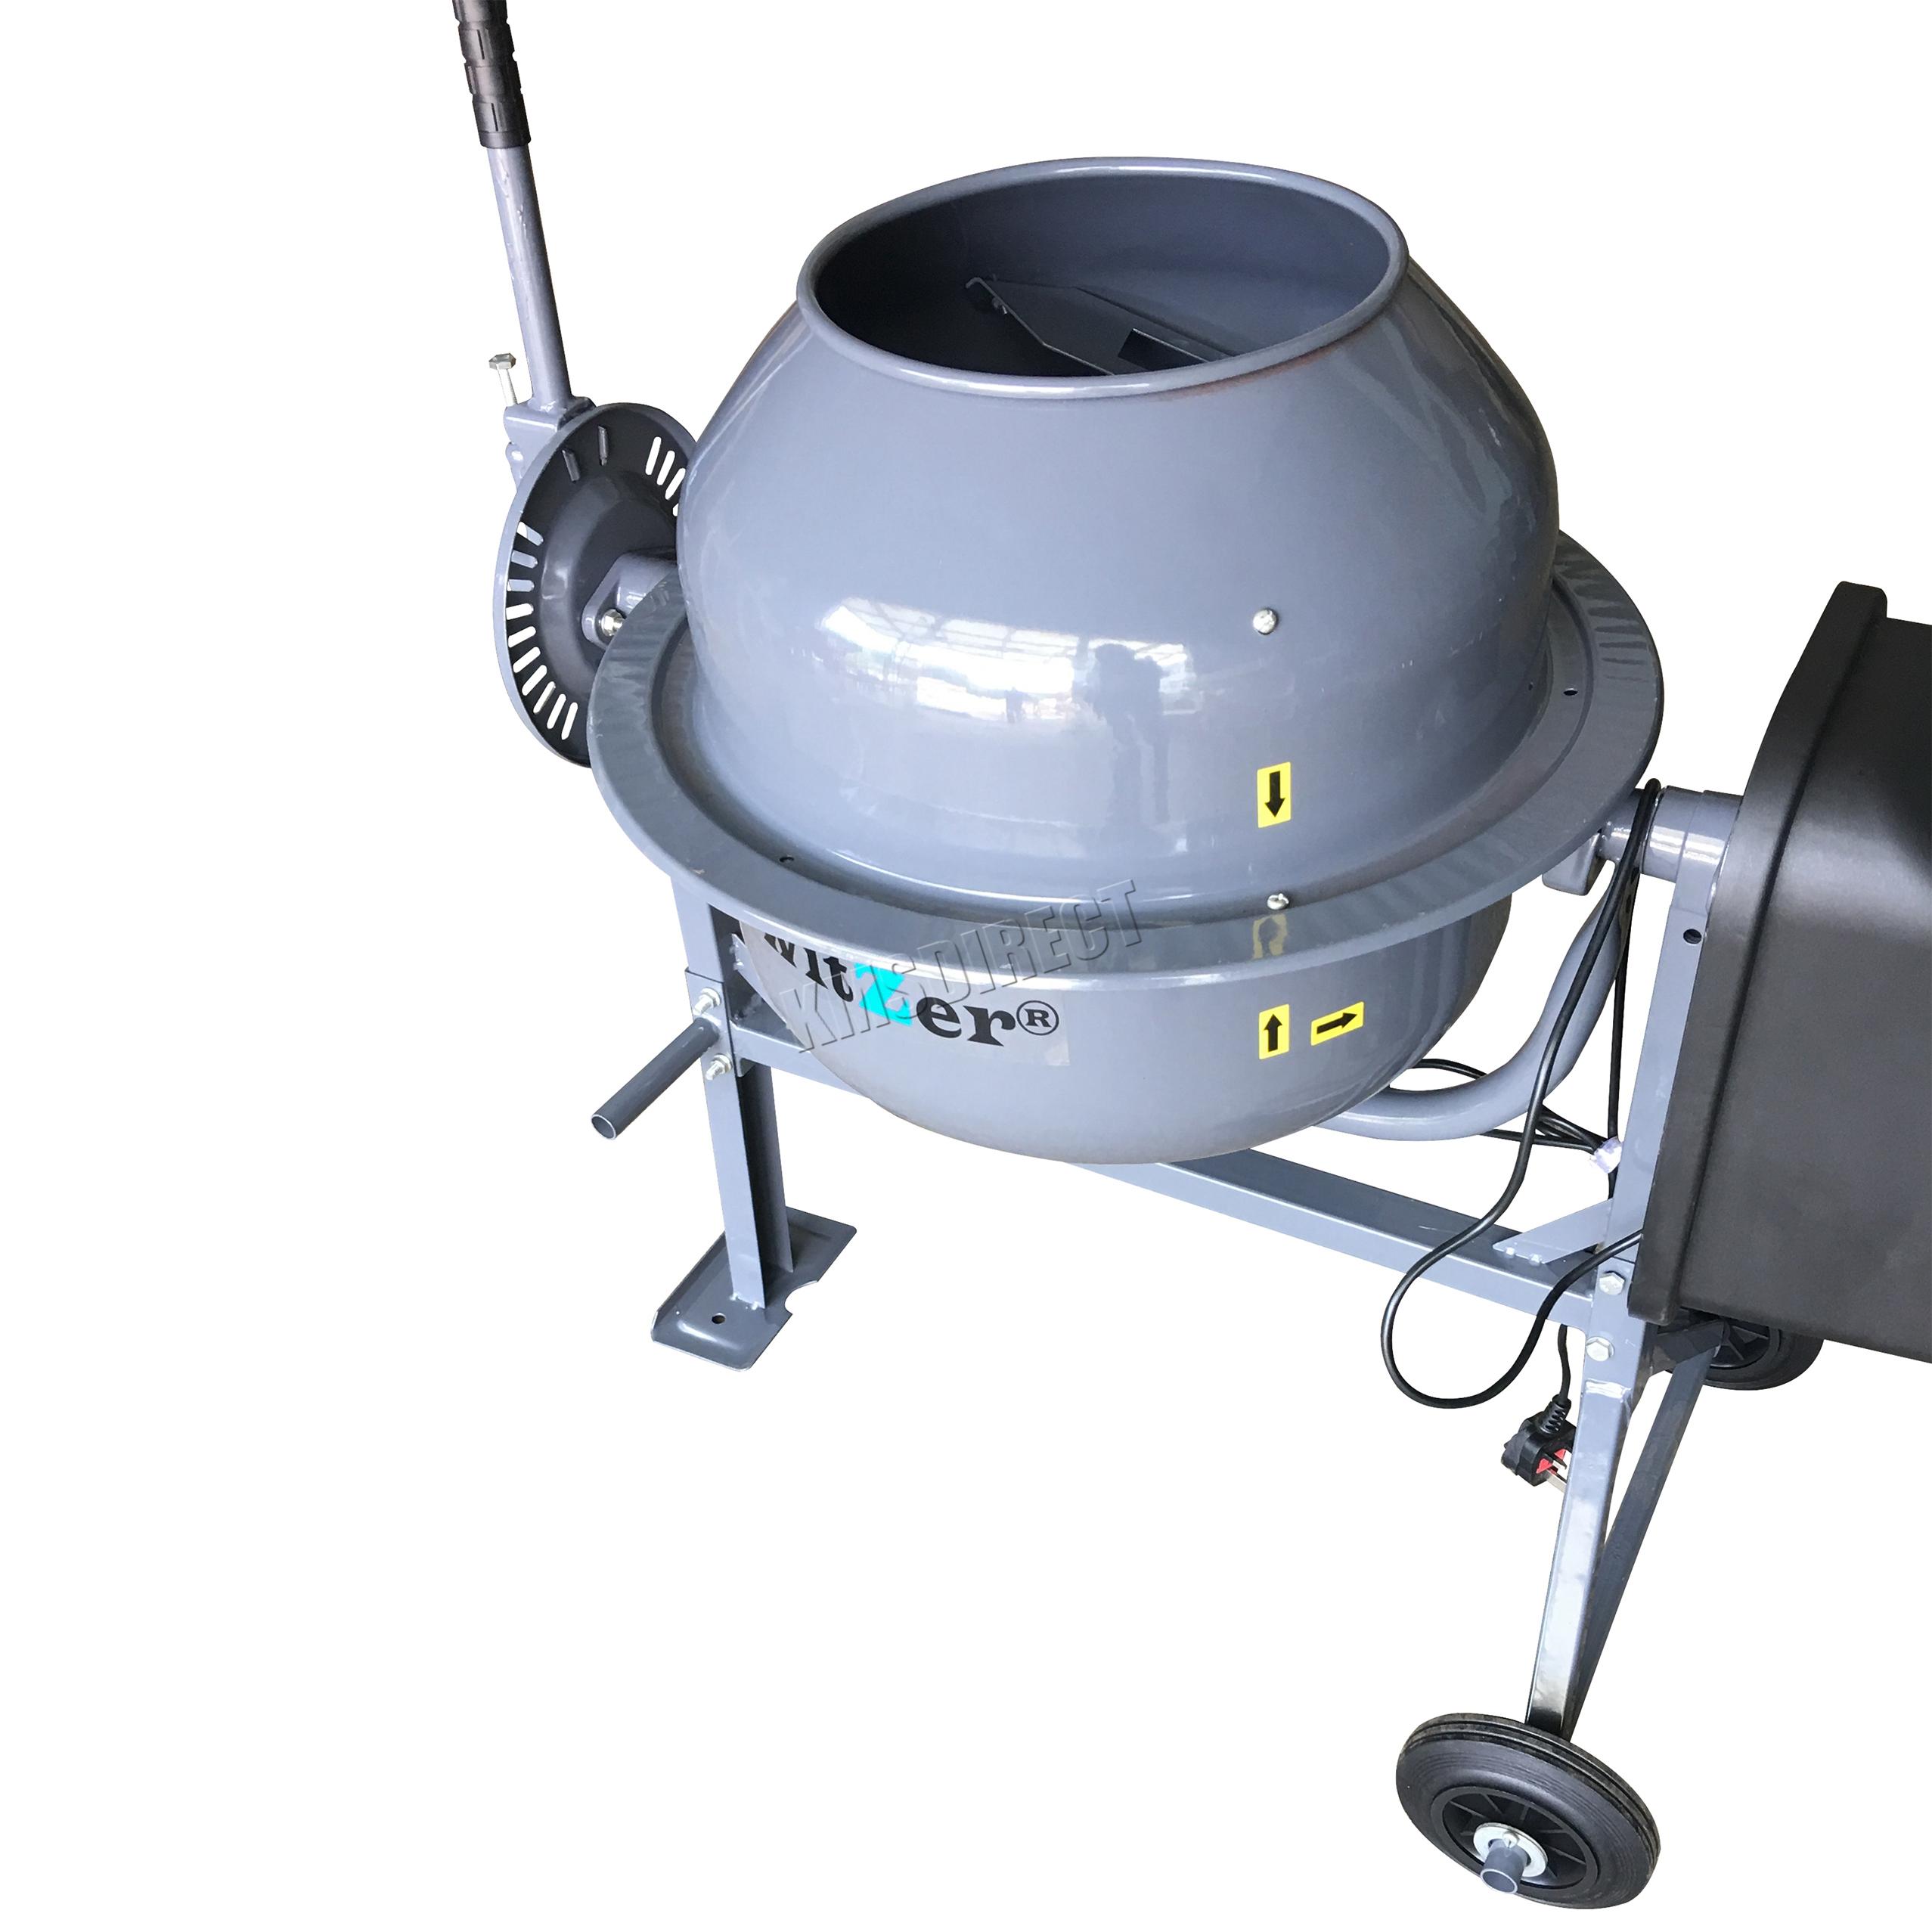 Switzer 250w Electric Concrete Cement Mixer Mortar Plaster